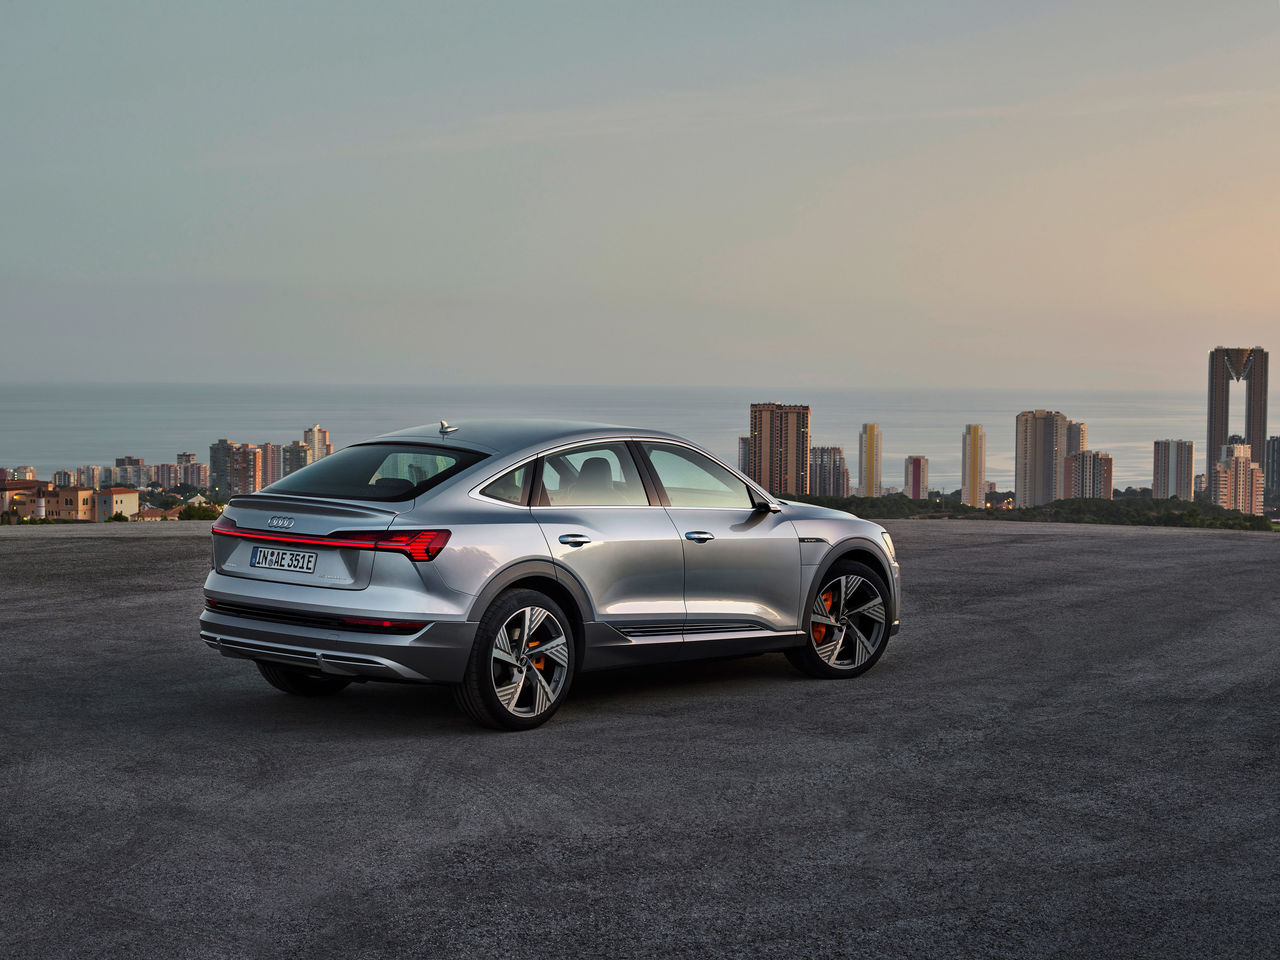 SUV Coupé for the e-tron Family: ||The Audi e-tron Sportback